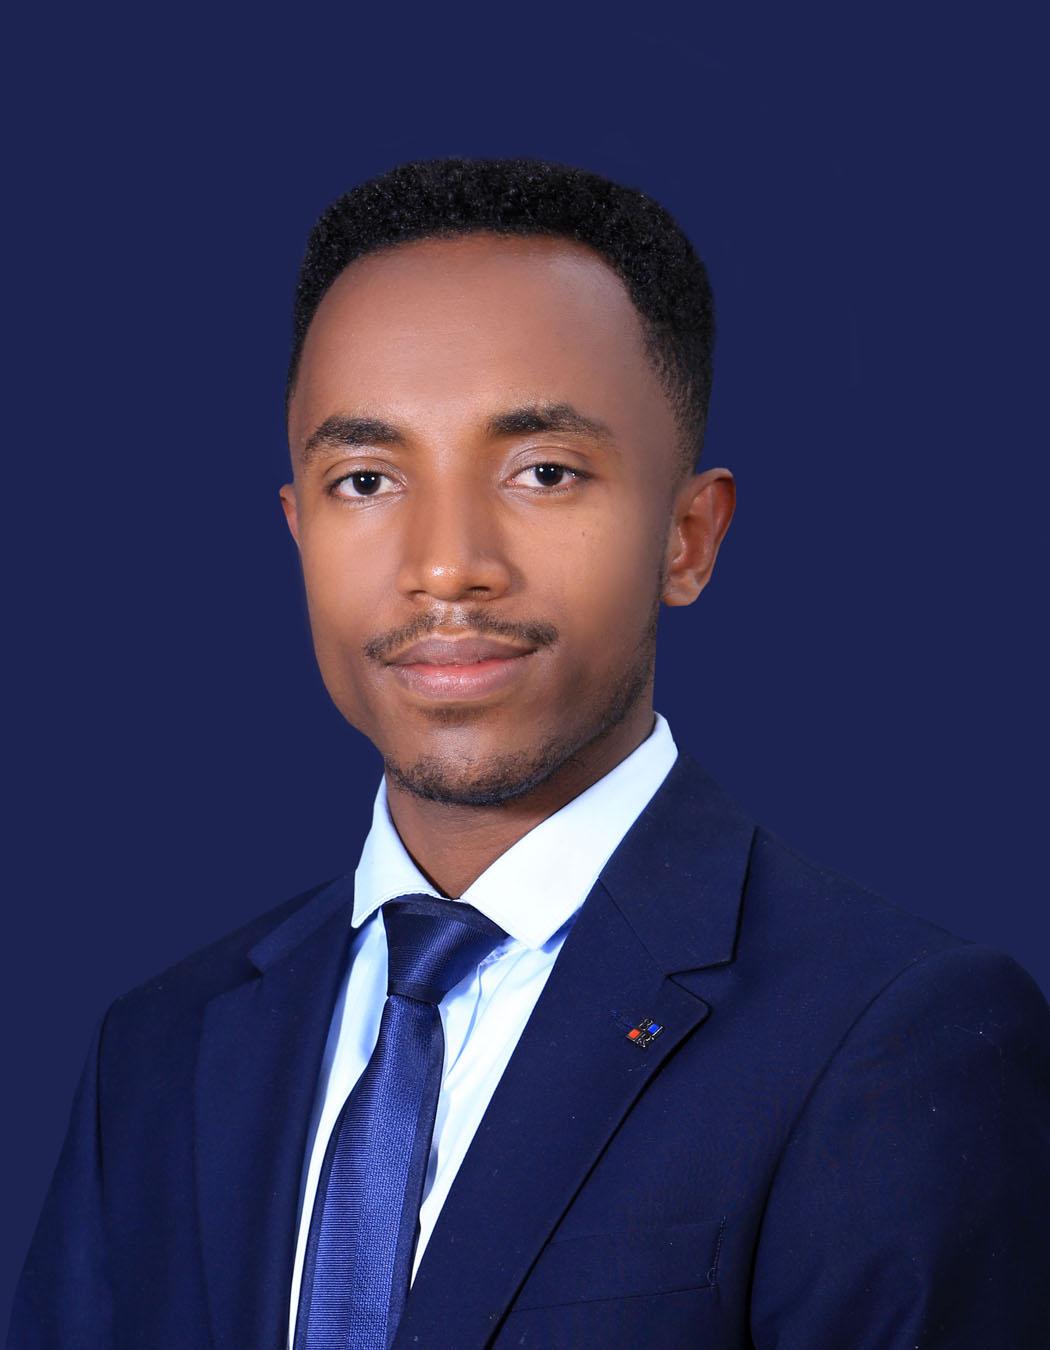 Dereje Ashenafi